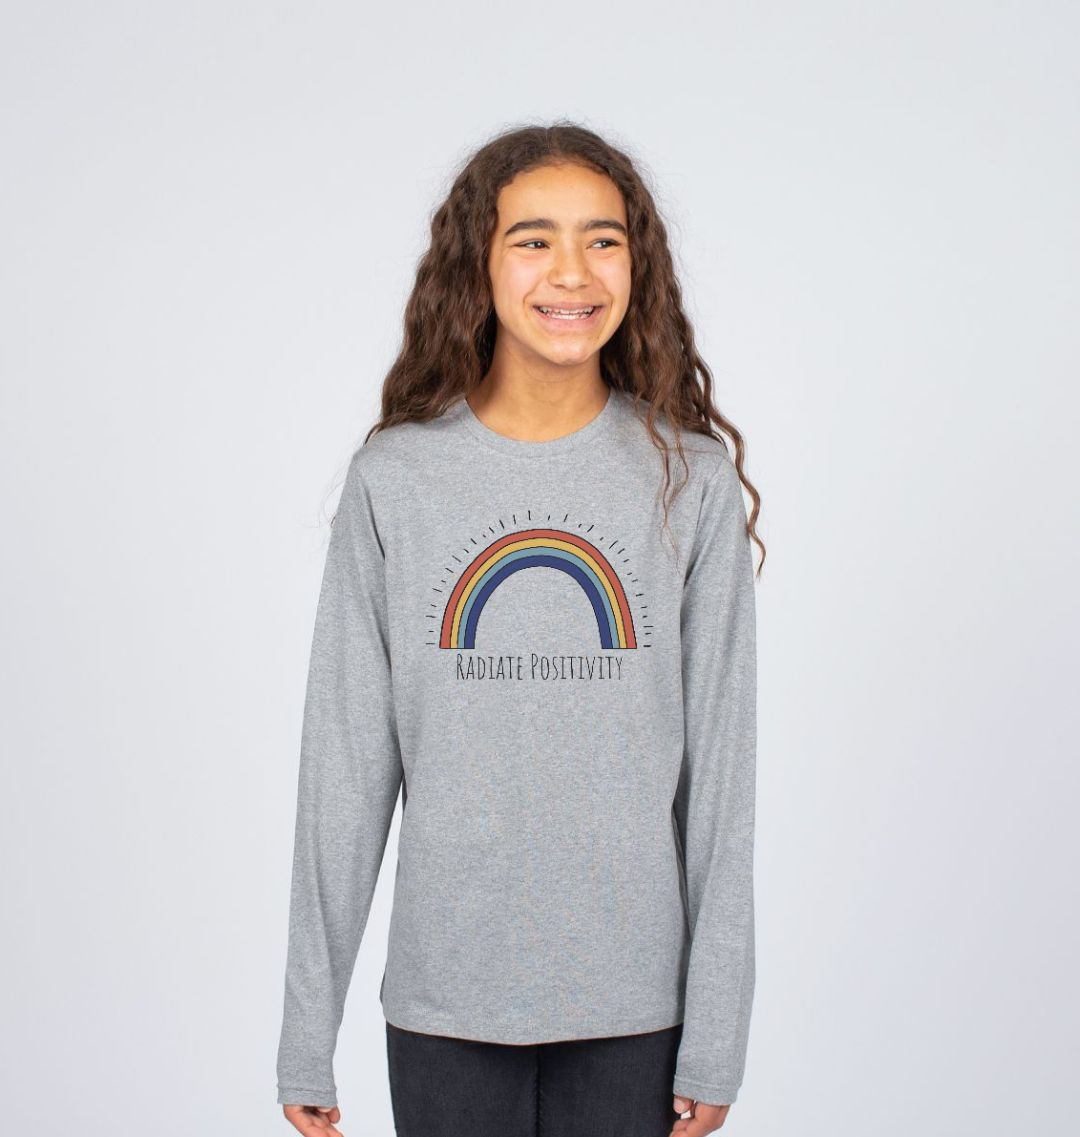 'Radiate Positivity' Rainbow Children's T Shirt - Soft Organic Cotton grey